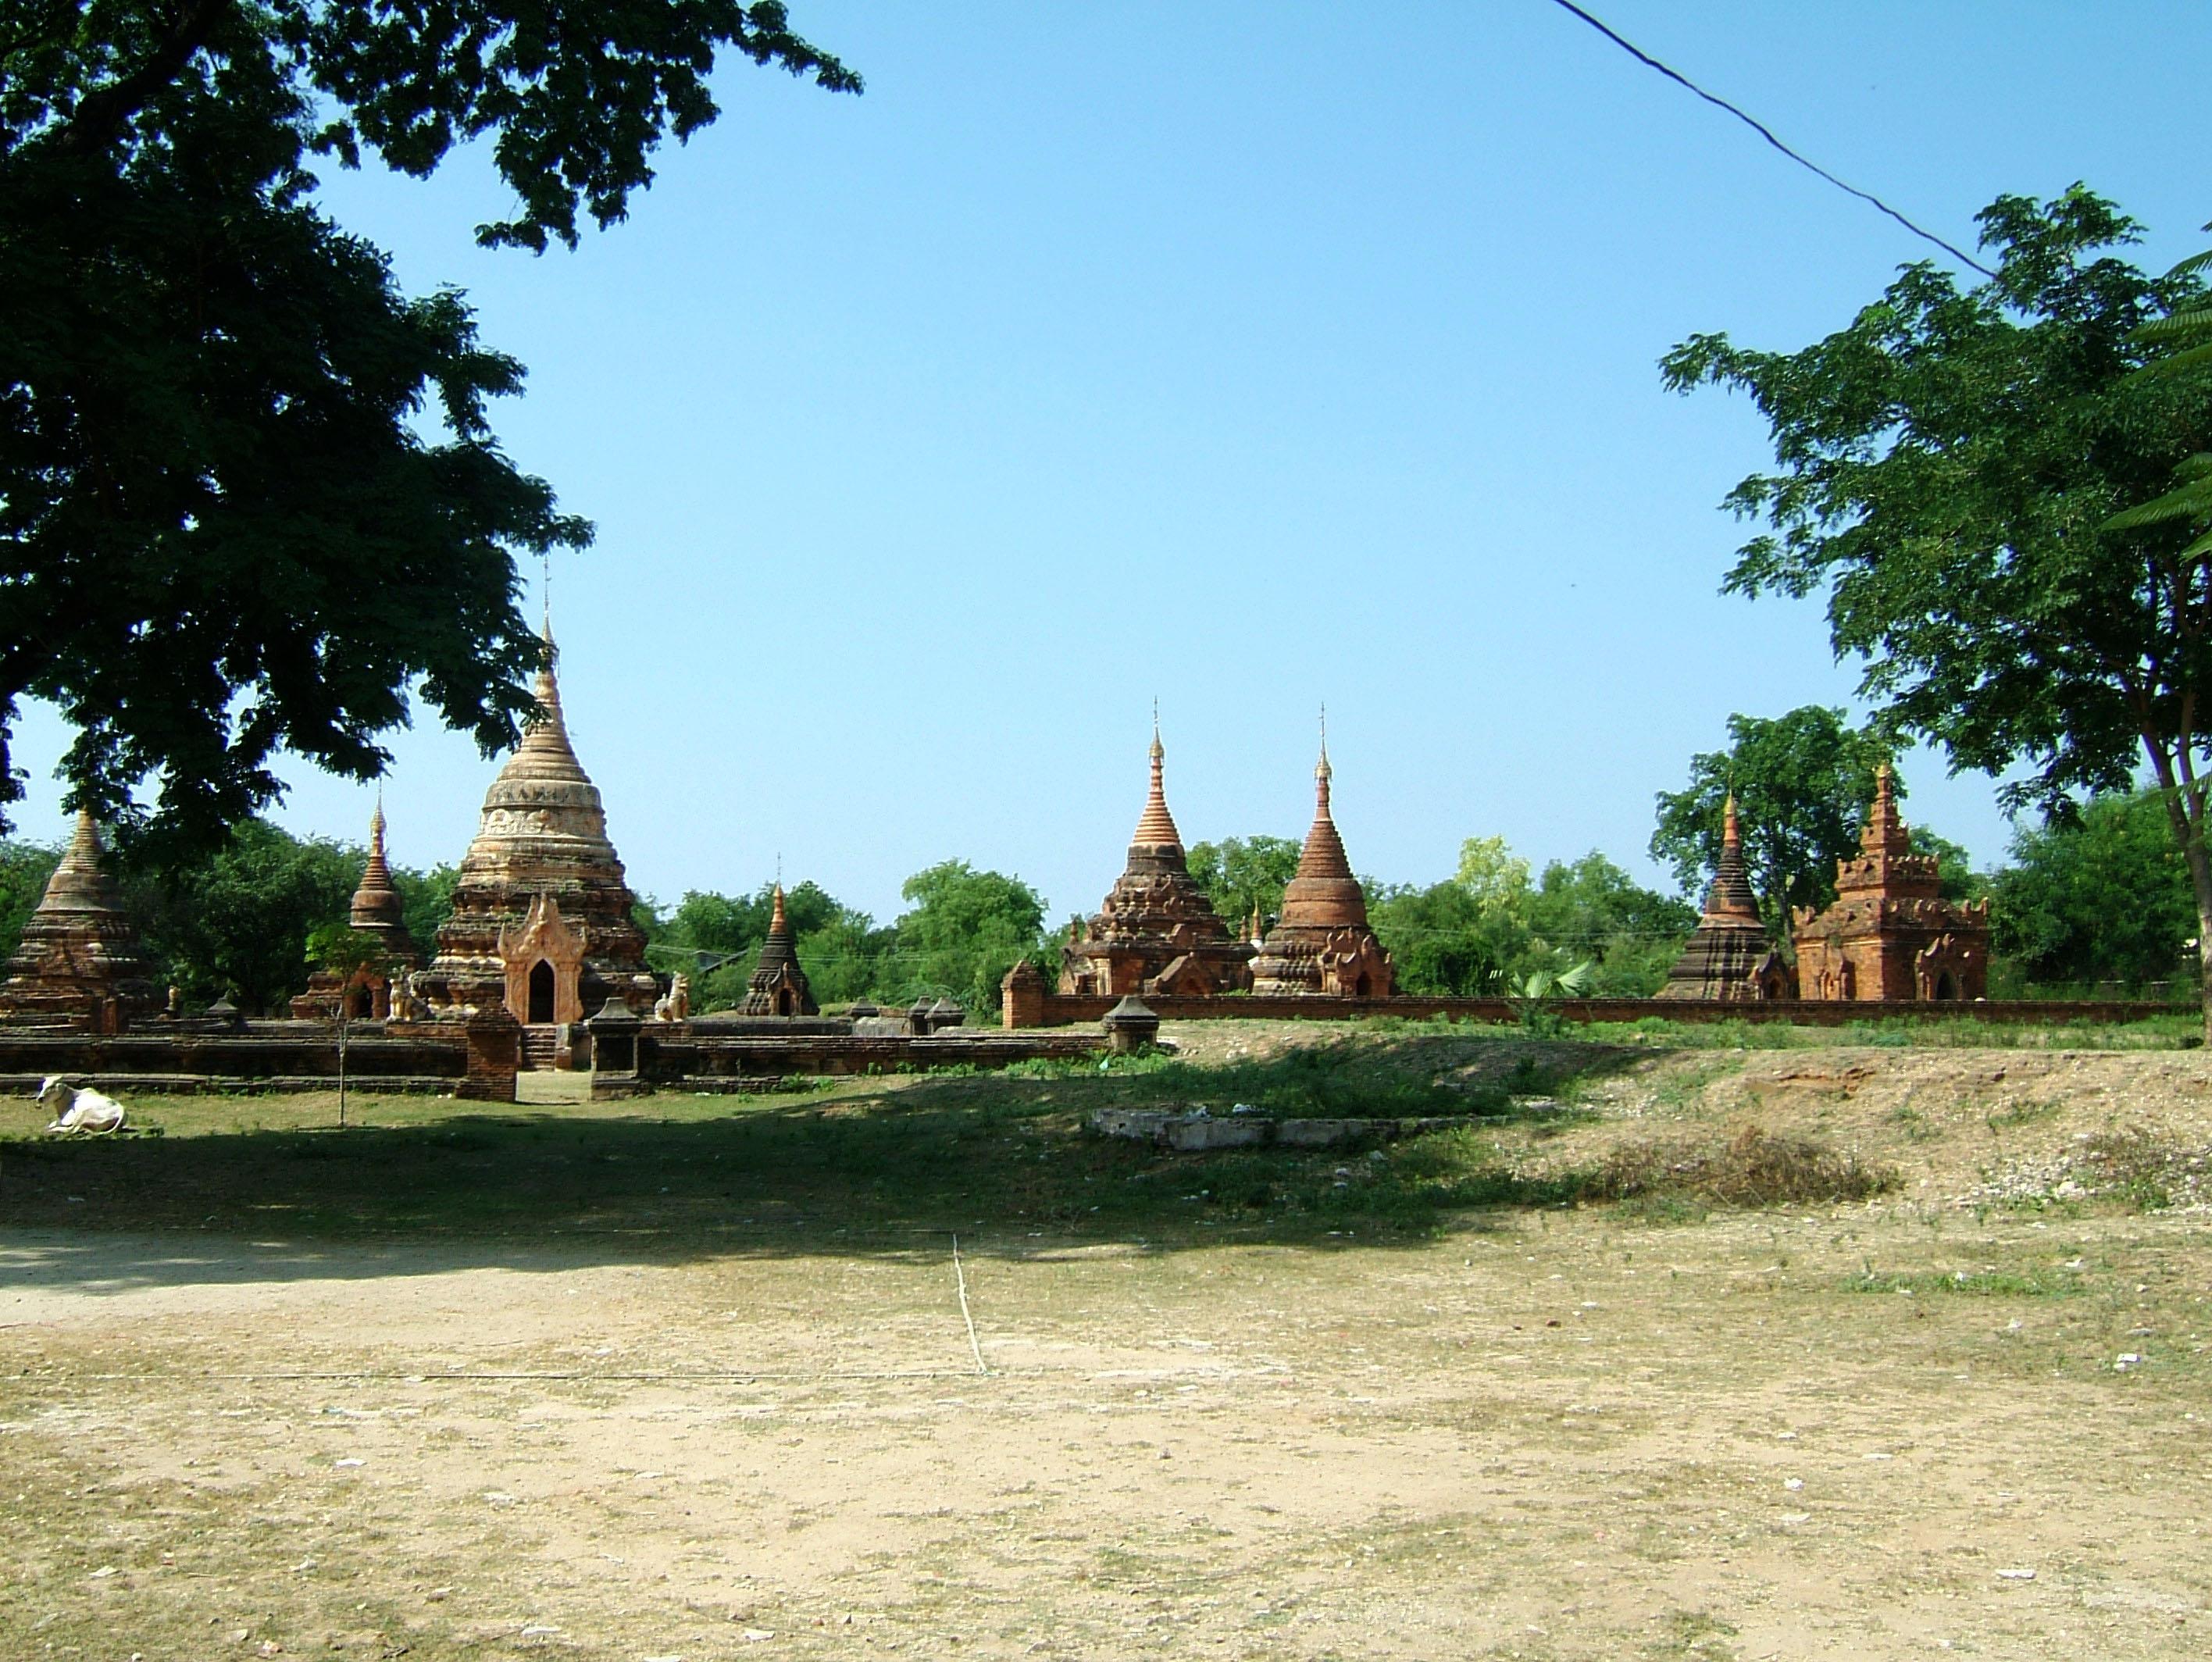 Myanmar Sagaing numerous pagodas Nov 2004 02